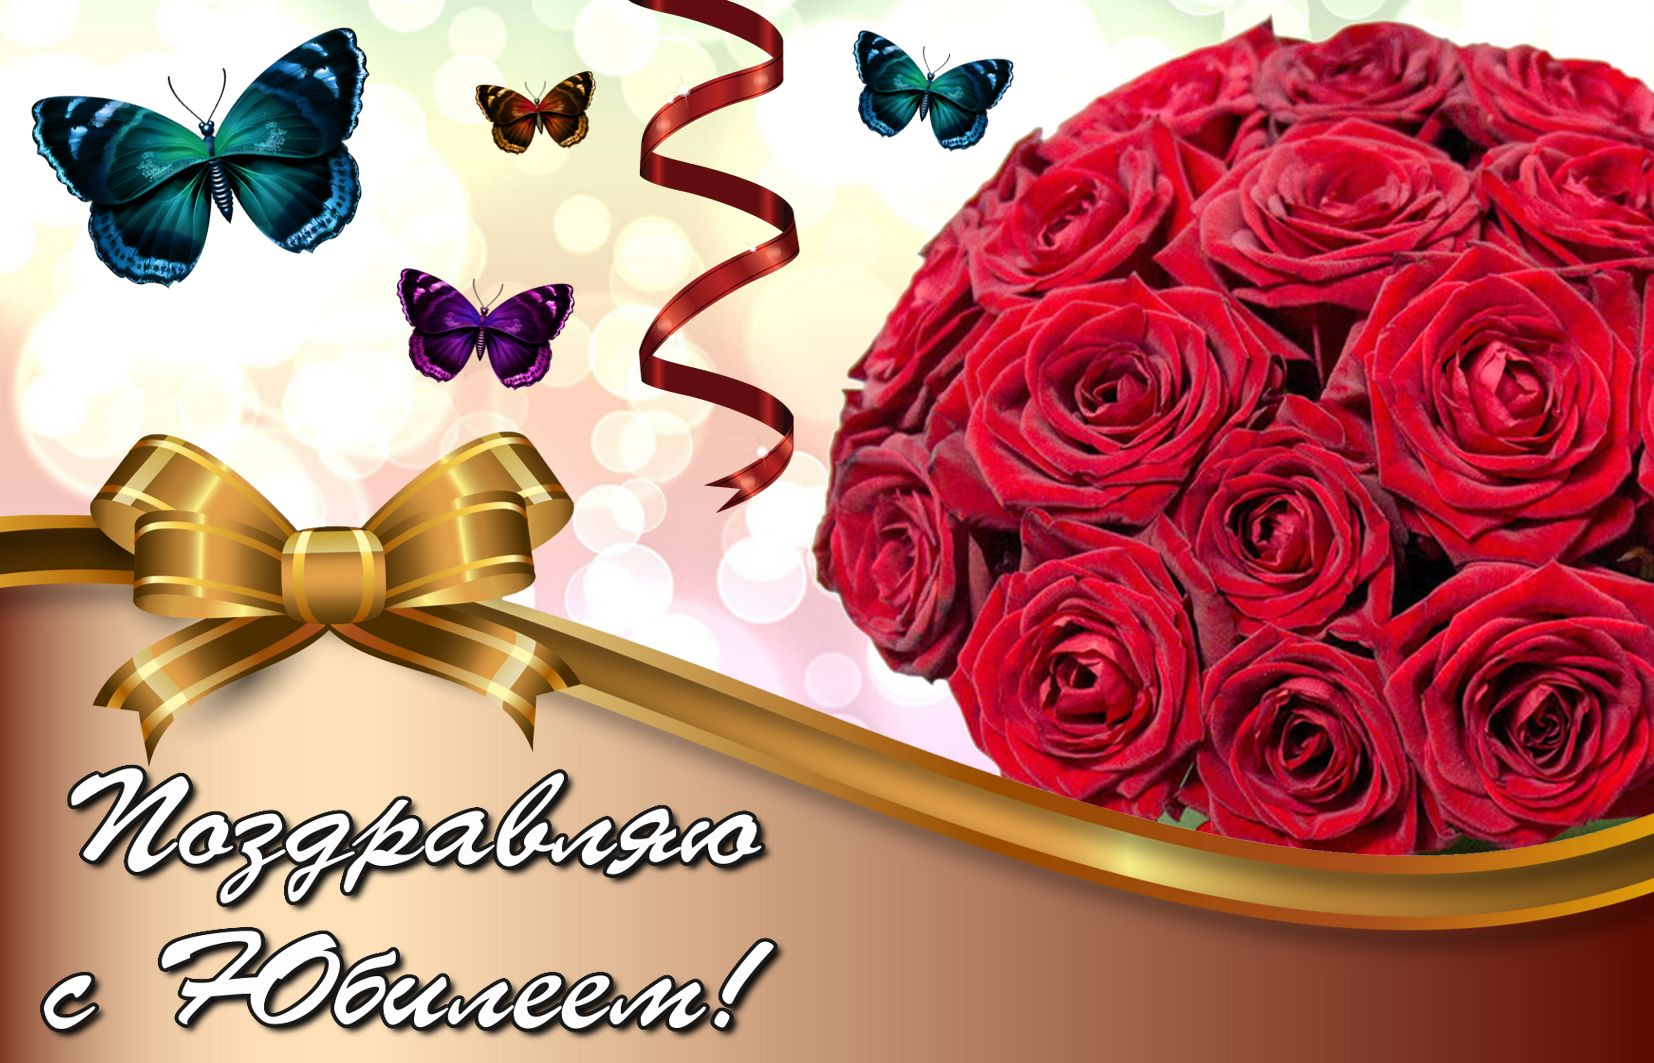 Открытка с розами и бабочками к юбилею